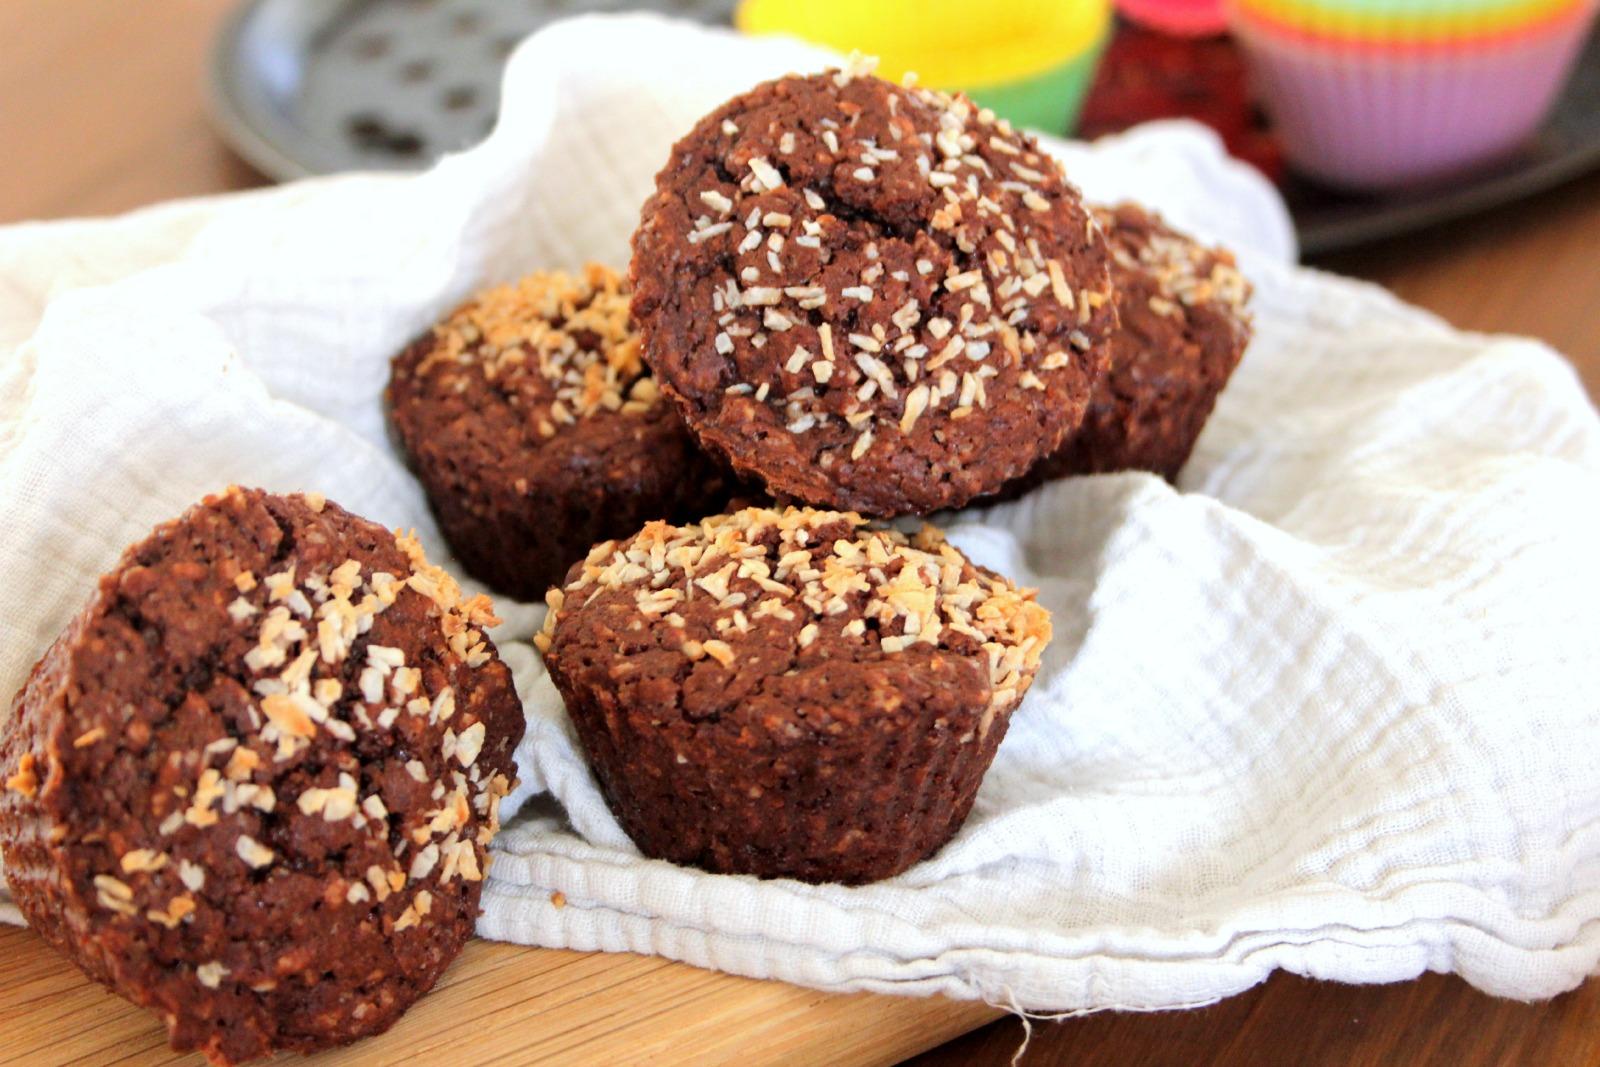 Choco-Coco Muffins [Vegan]